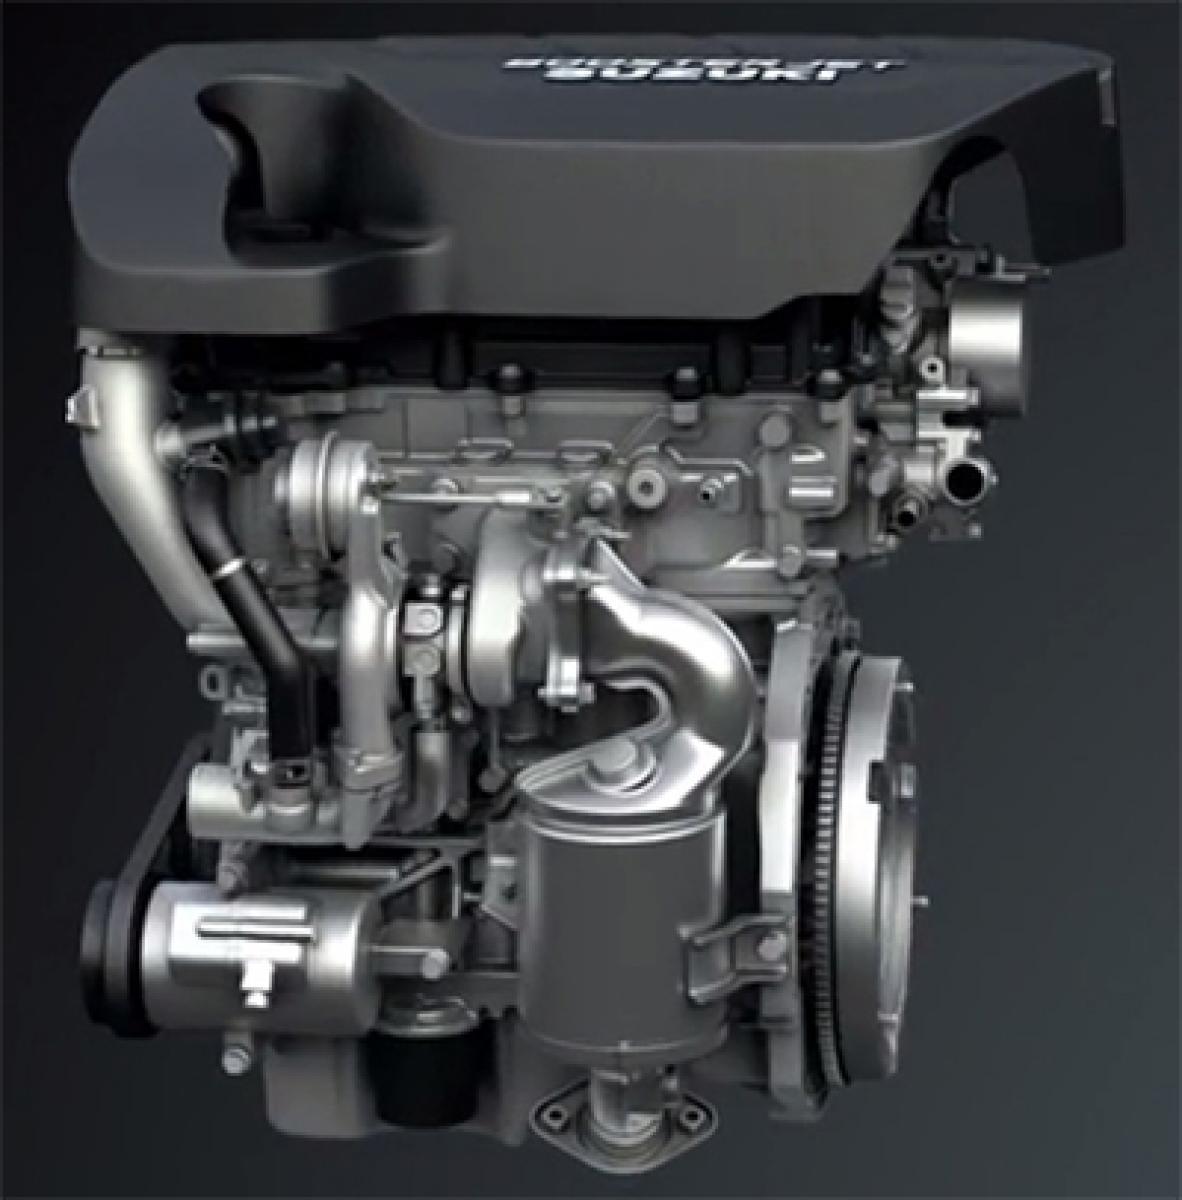 Maruti to bring mild hybrid tech, Boosterjet engine to India